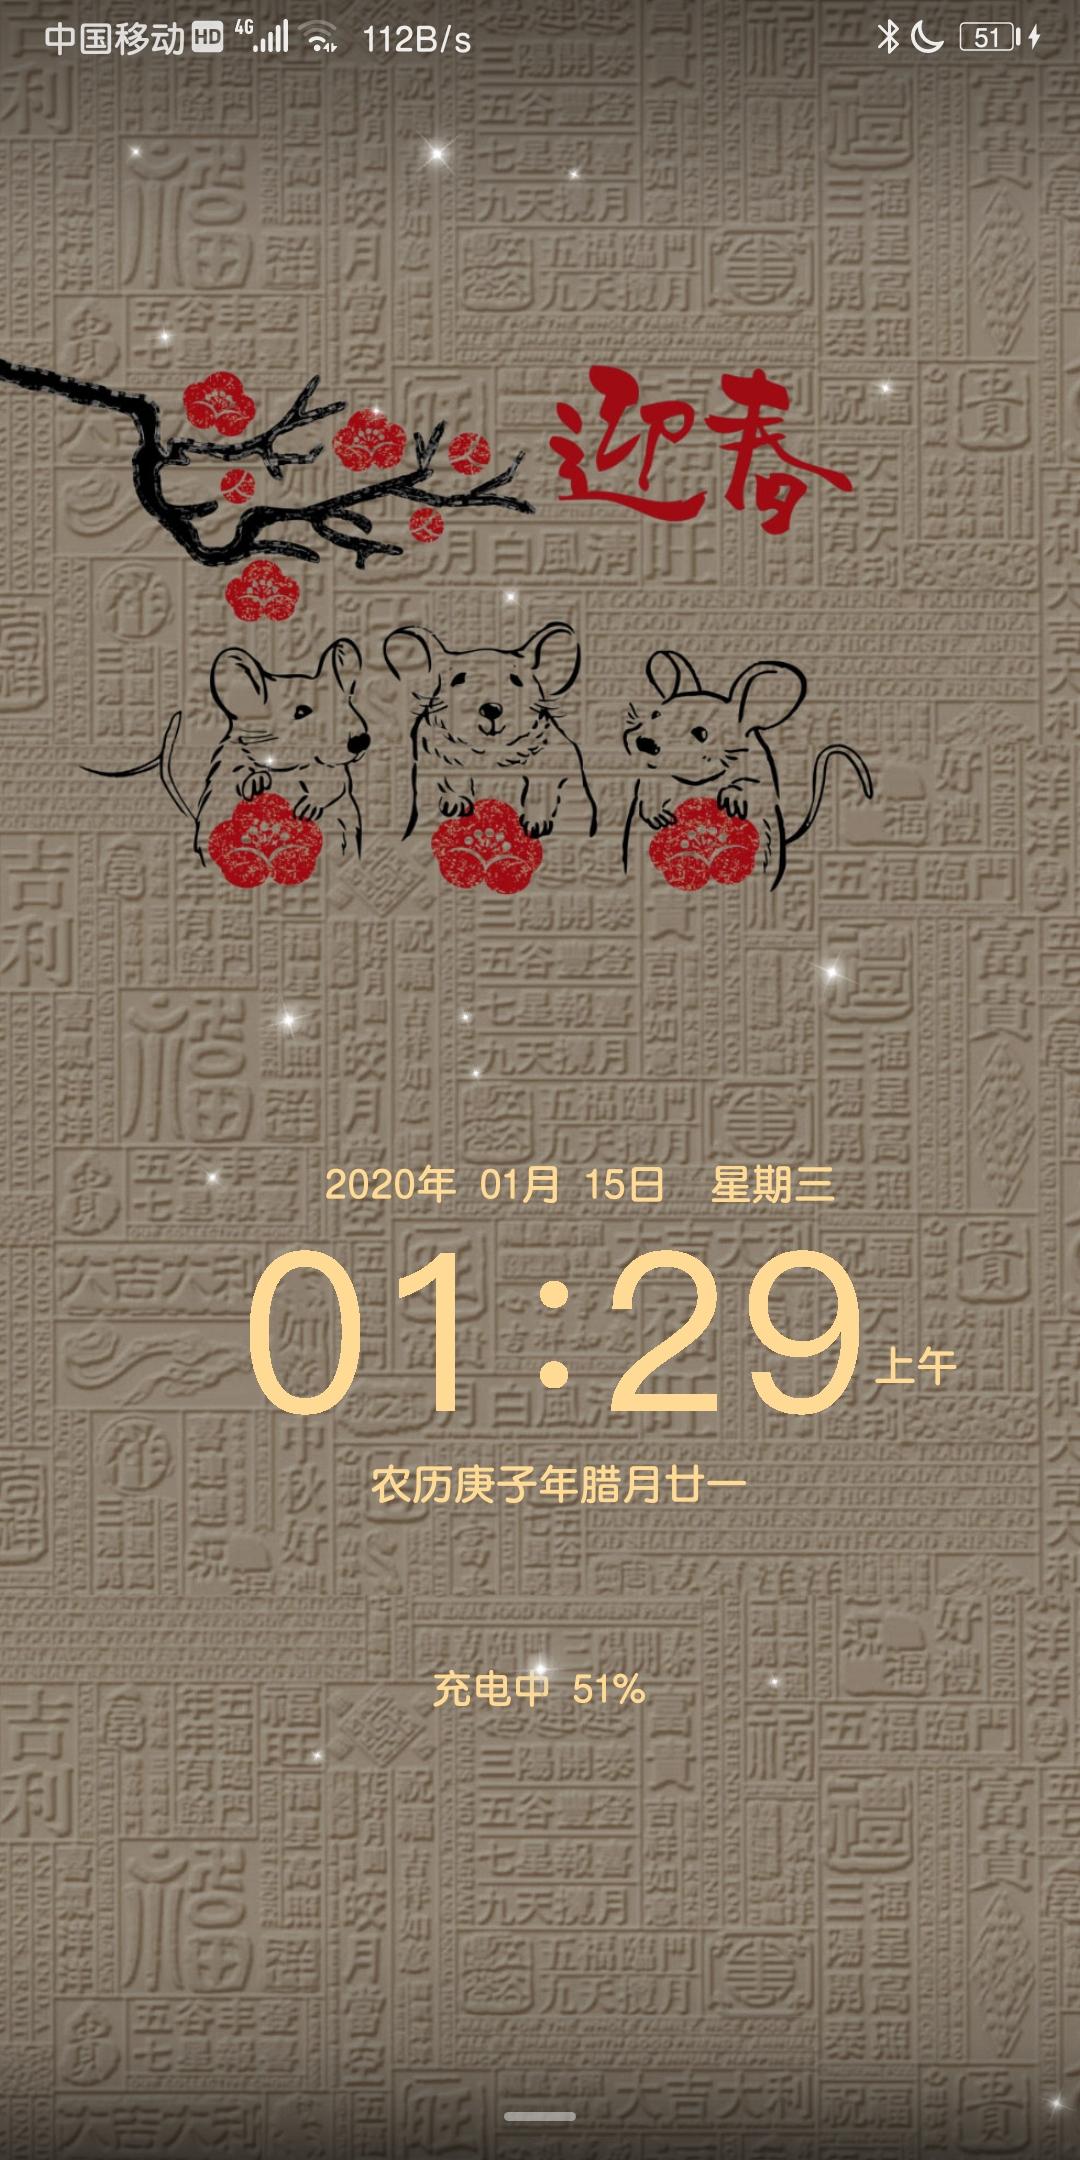 Screenshot_20200115_012919_com.android.keyguard.jpg